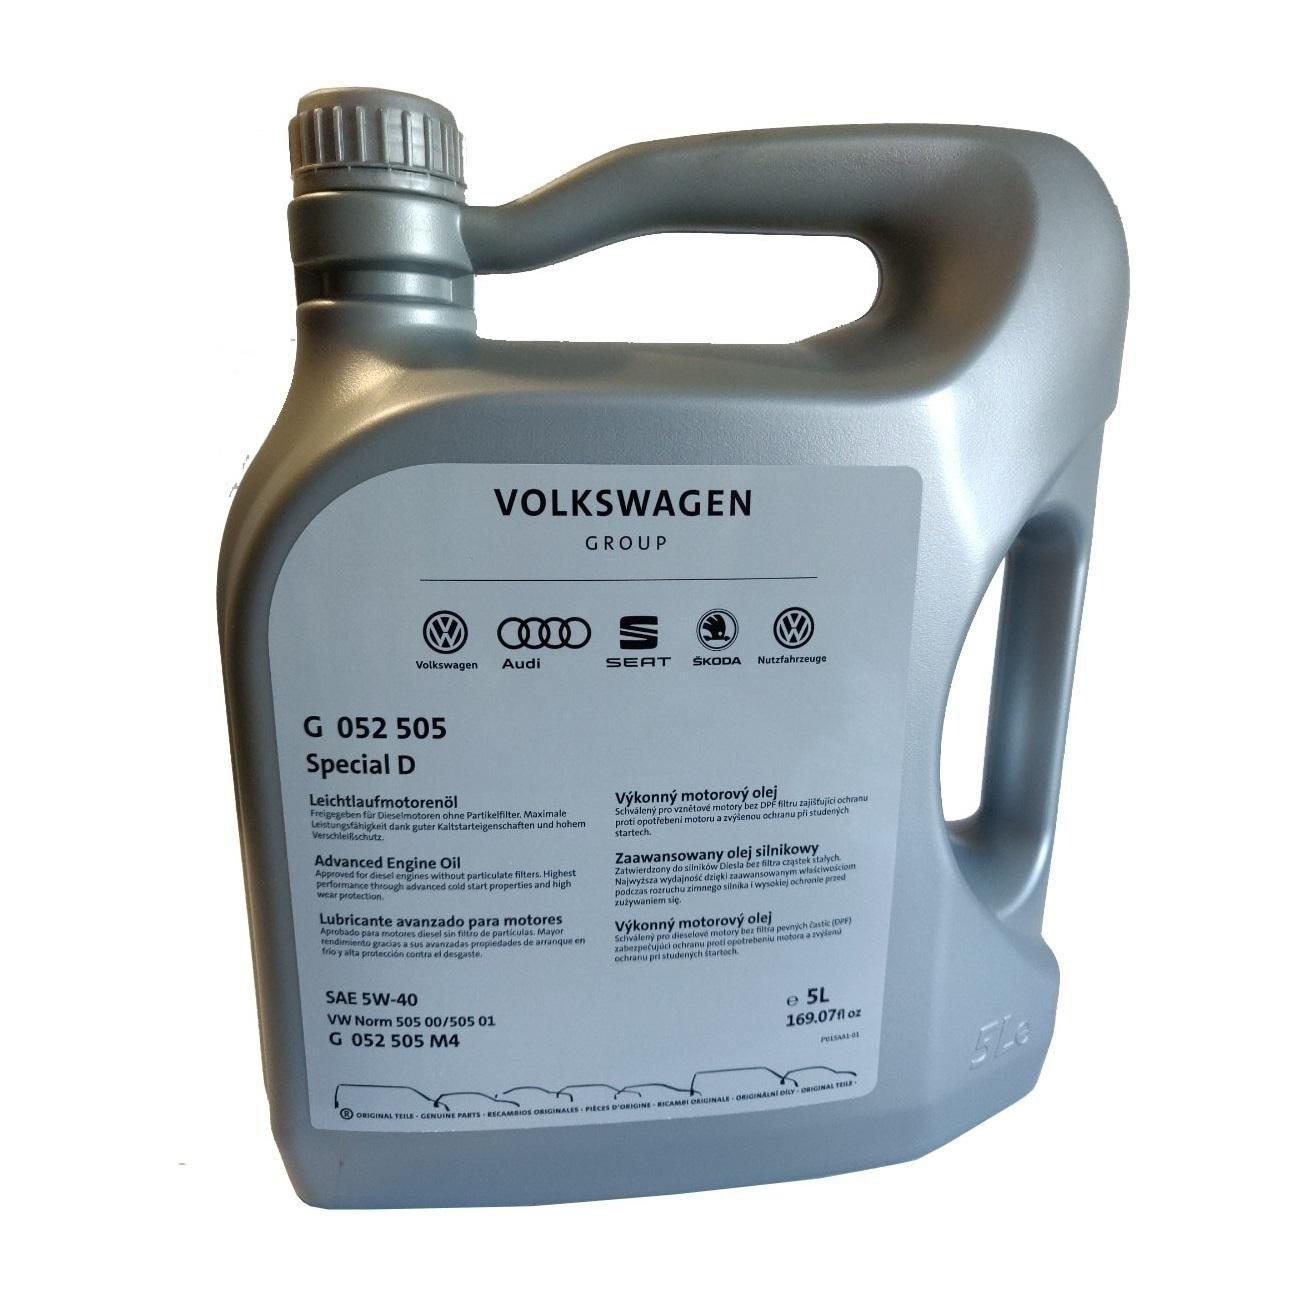 VW AUDI Special D (vw 505.01) 5W-40